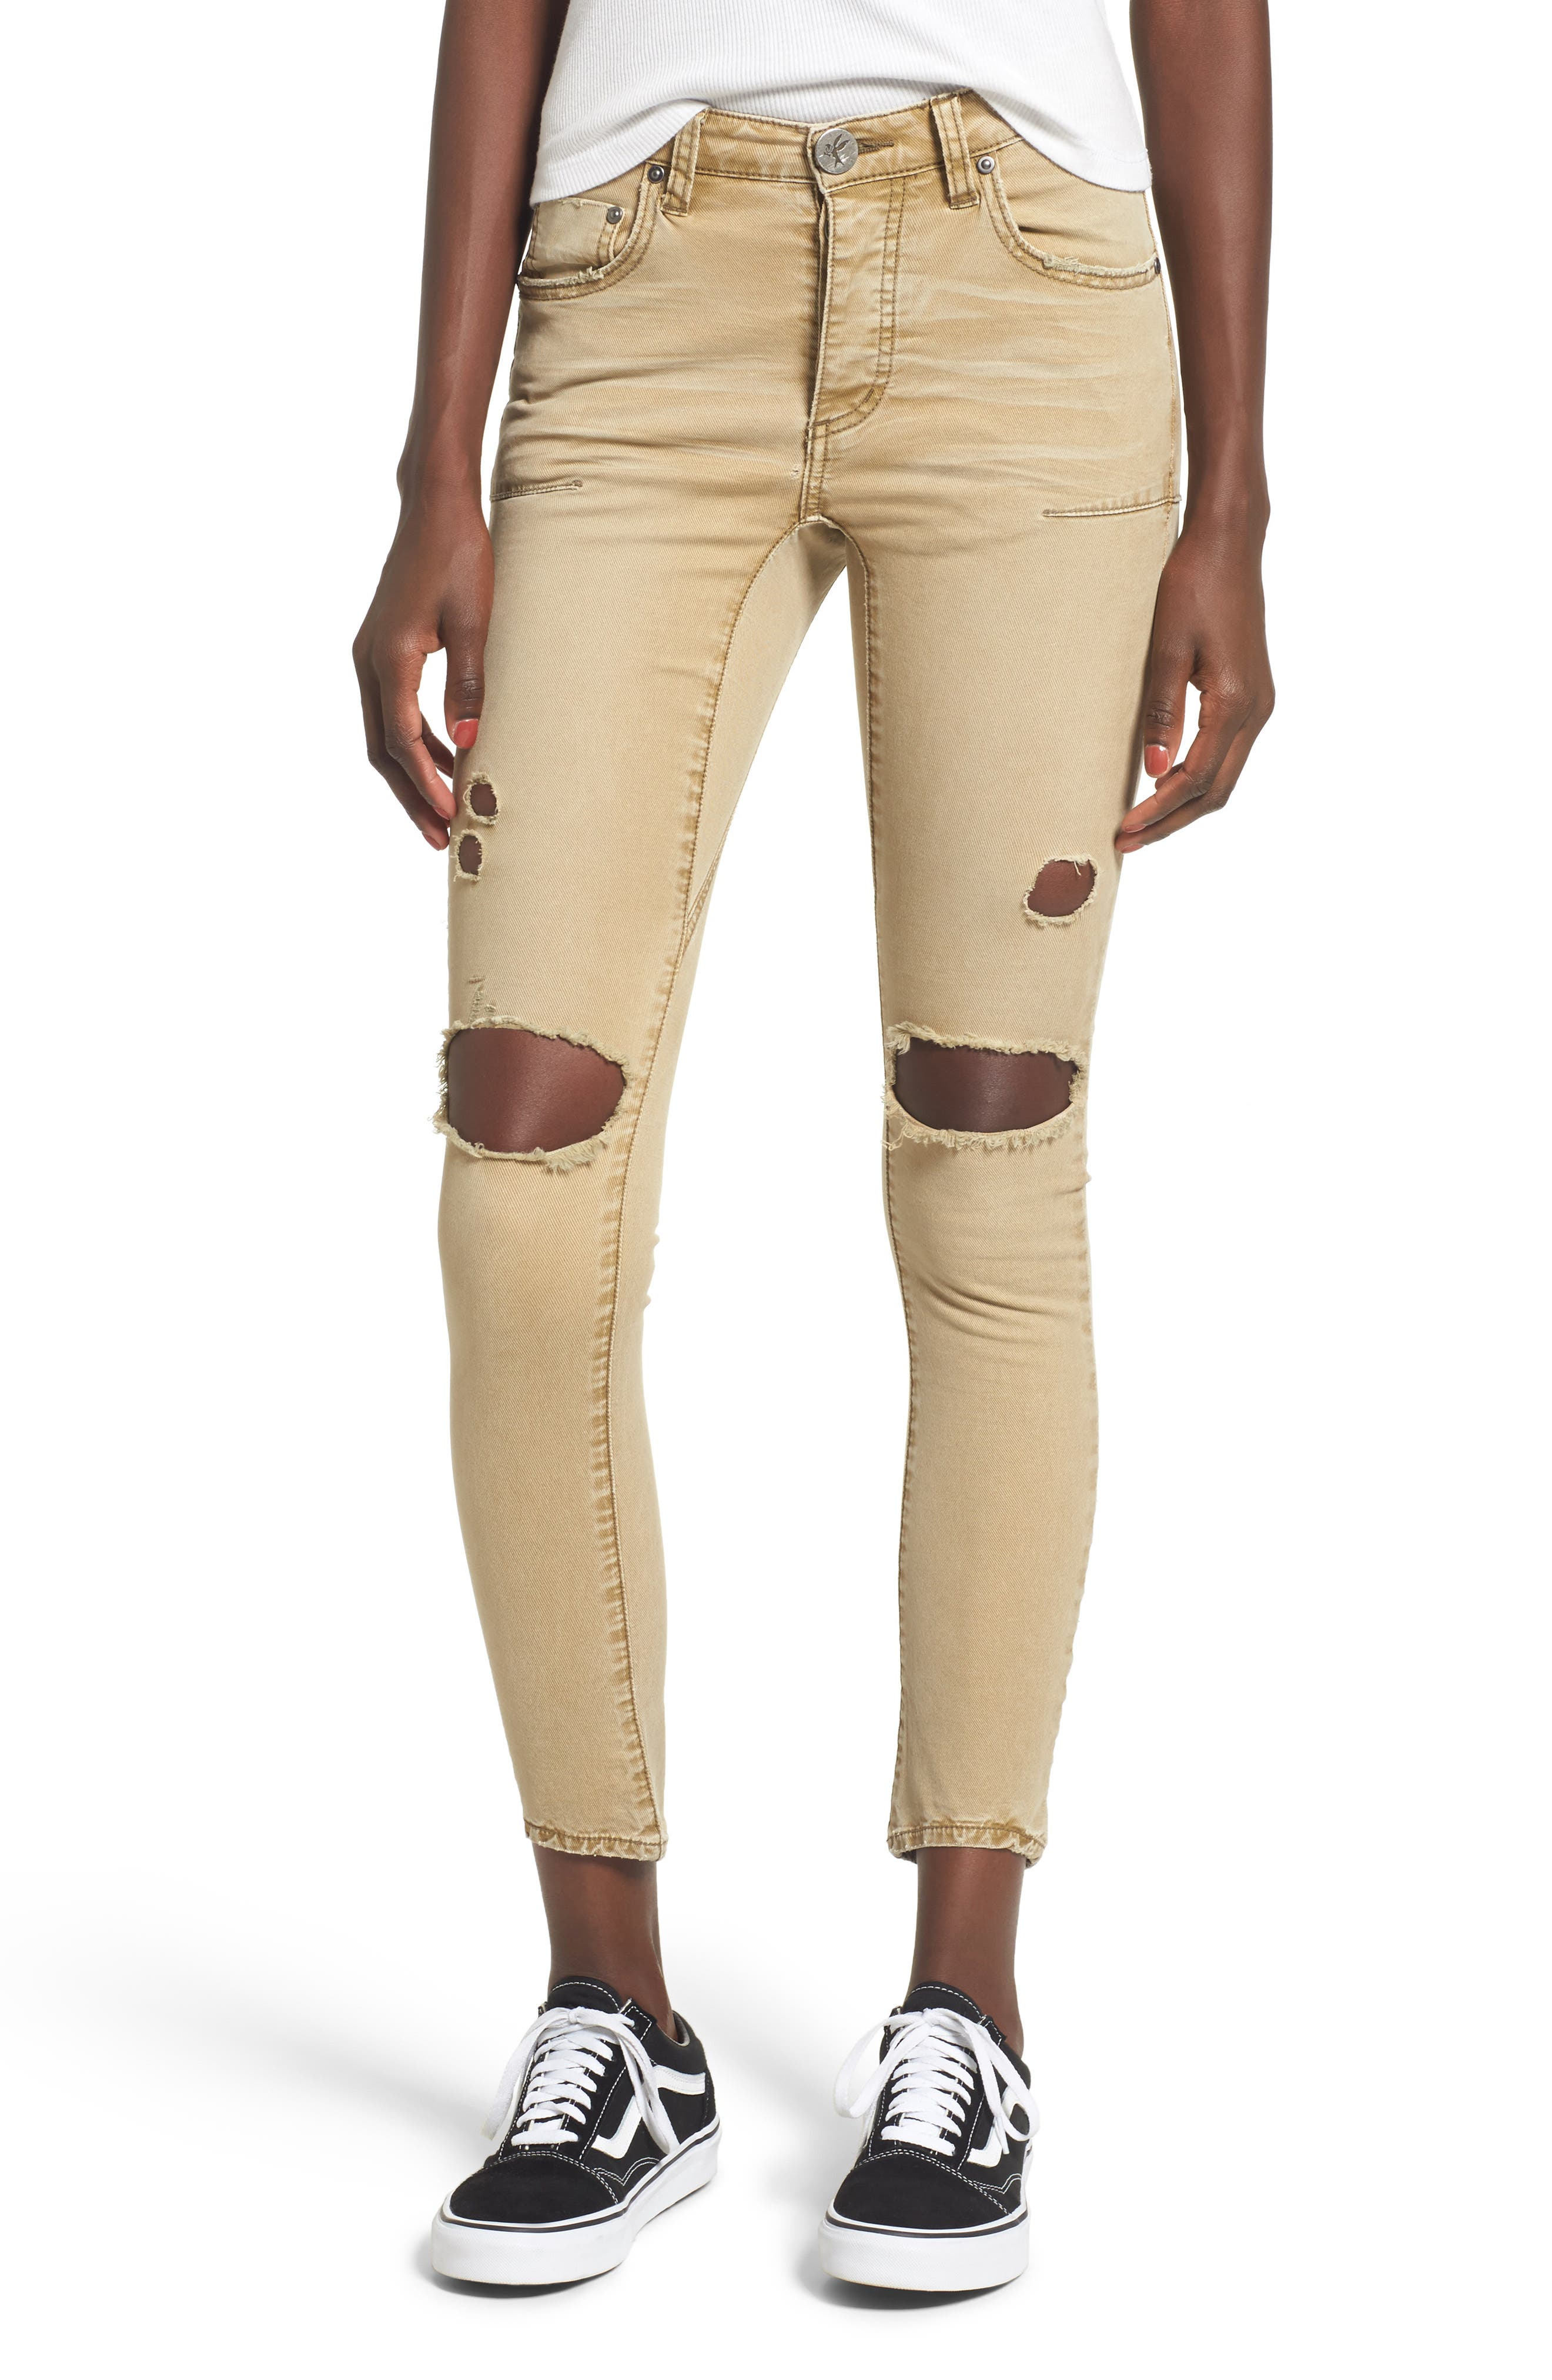 Alternate Image 1 Selected - One Teaspoon Freebirds Ripped Low Waist Skinny Jeans (Tobacco)